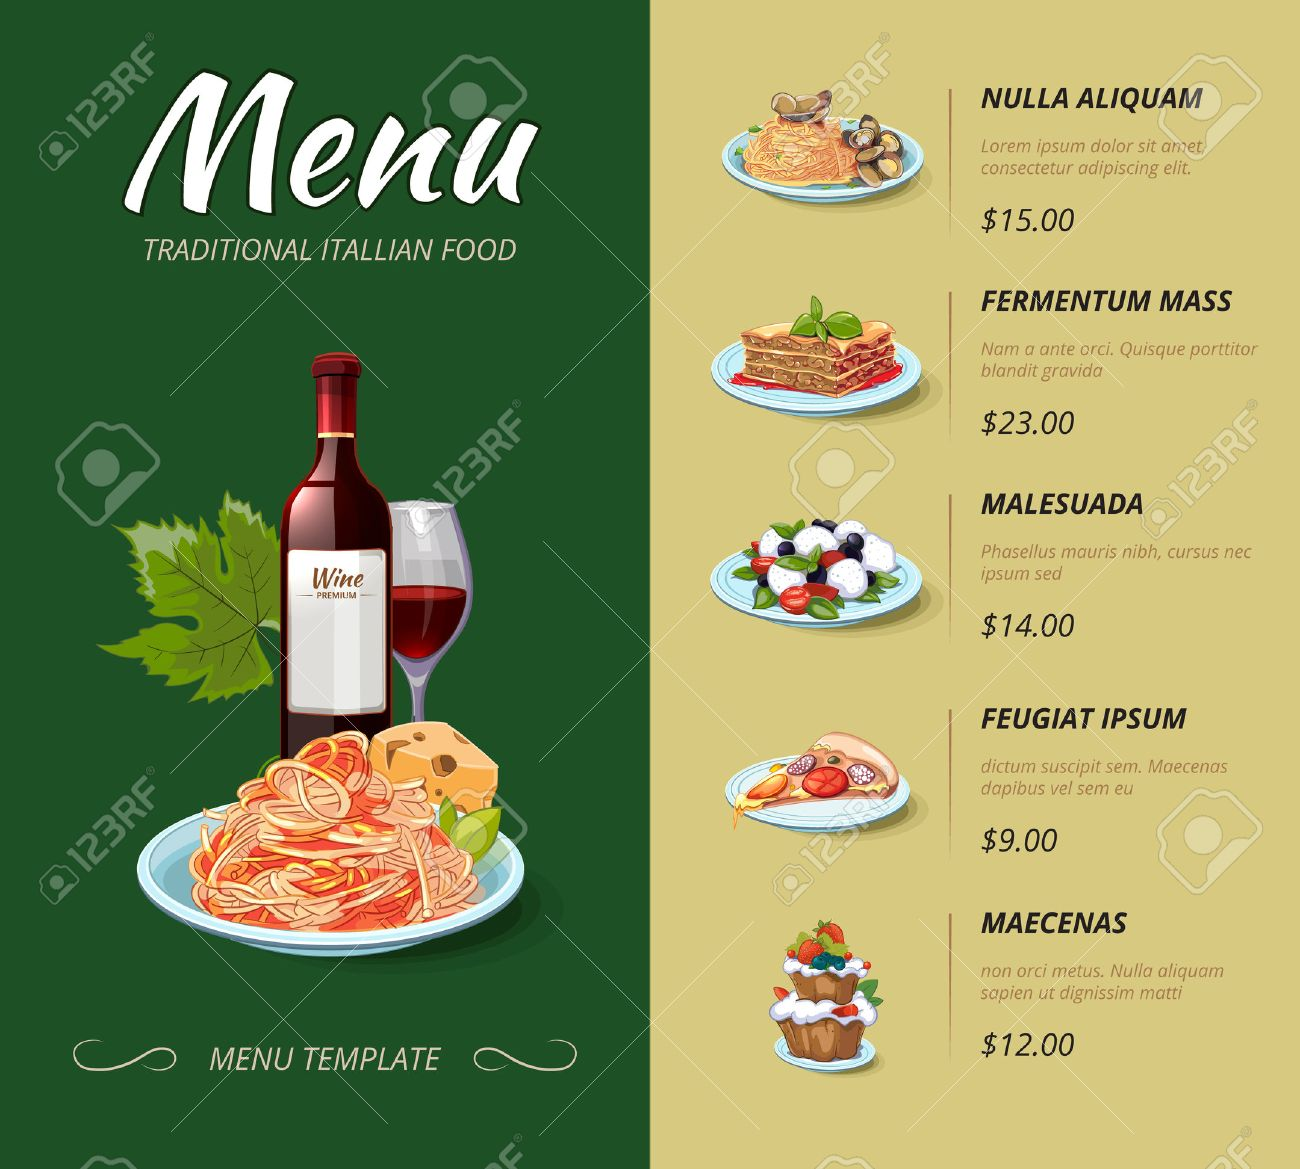 Italian cuisine restaurant menu. Food dinner, cooking lunch, pasta spaghetti, italy cheese illustration. Vector design template - 50636347